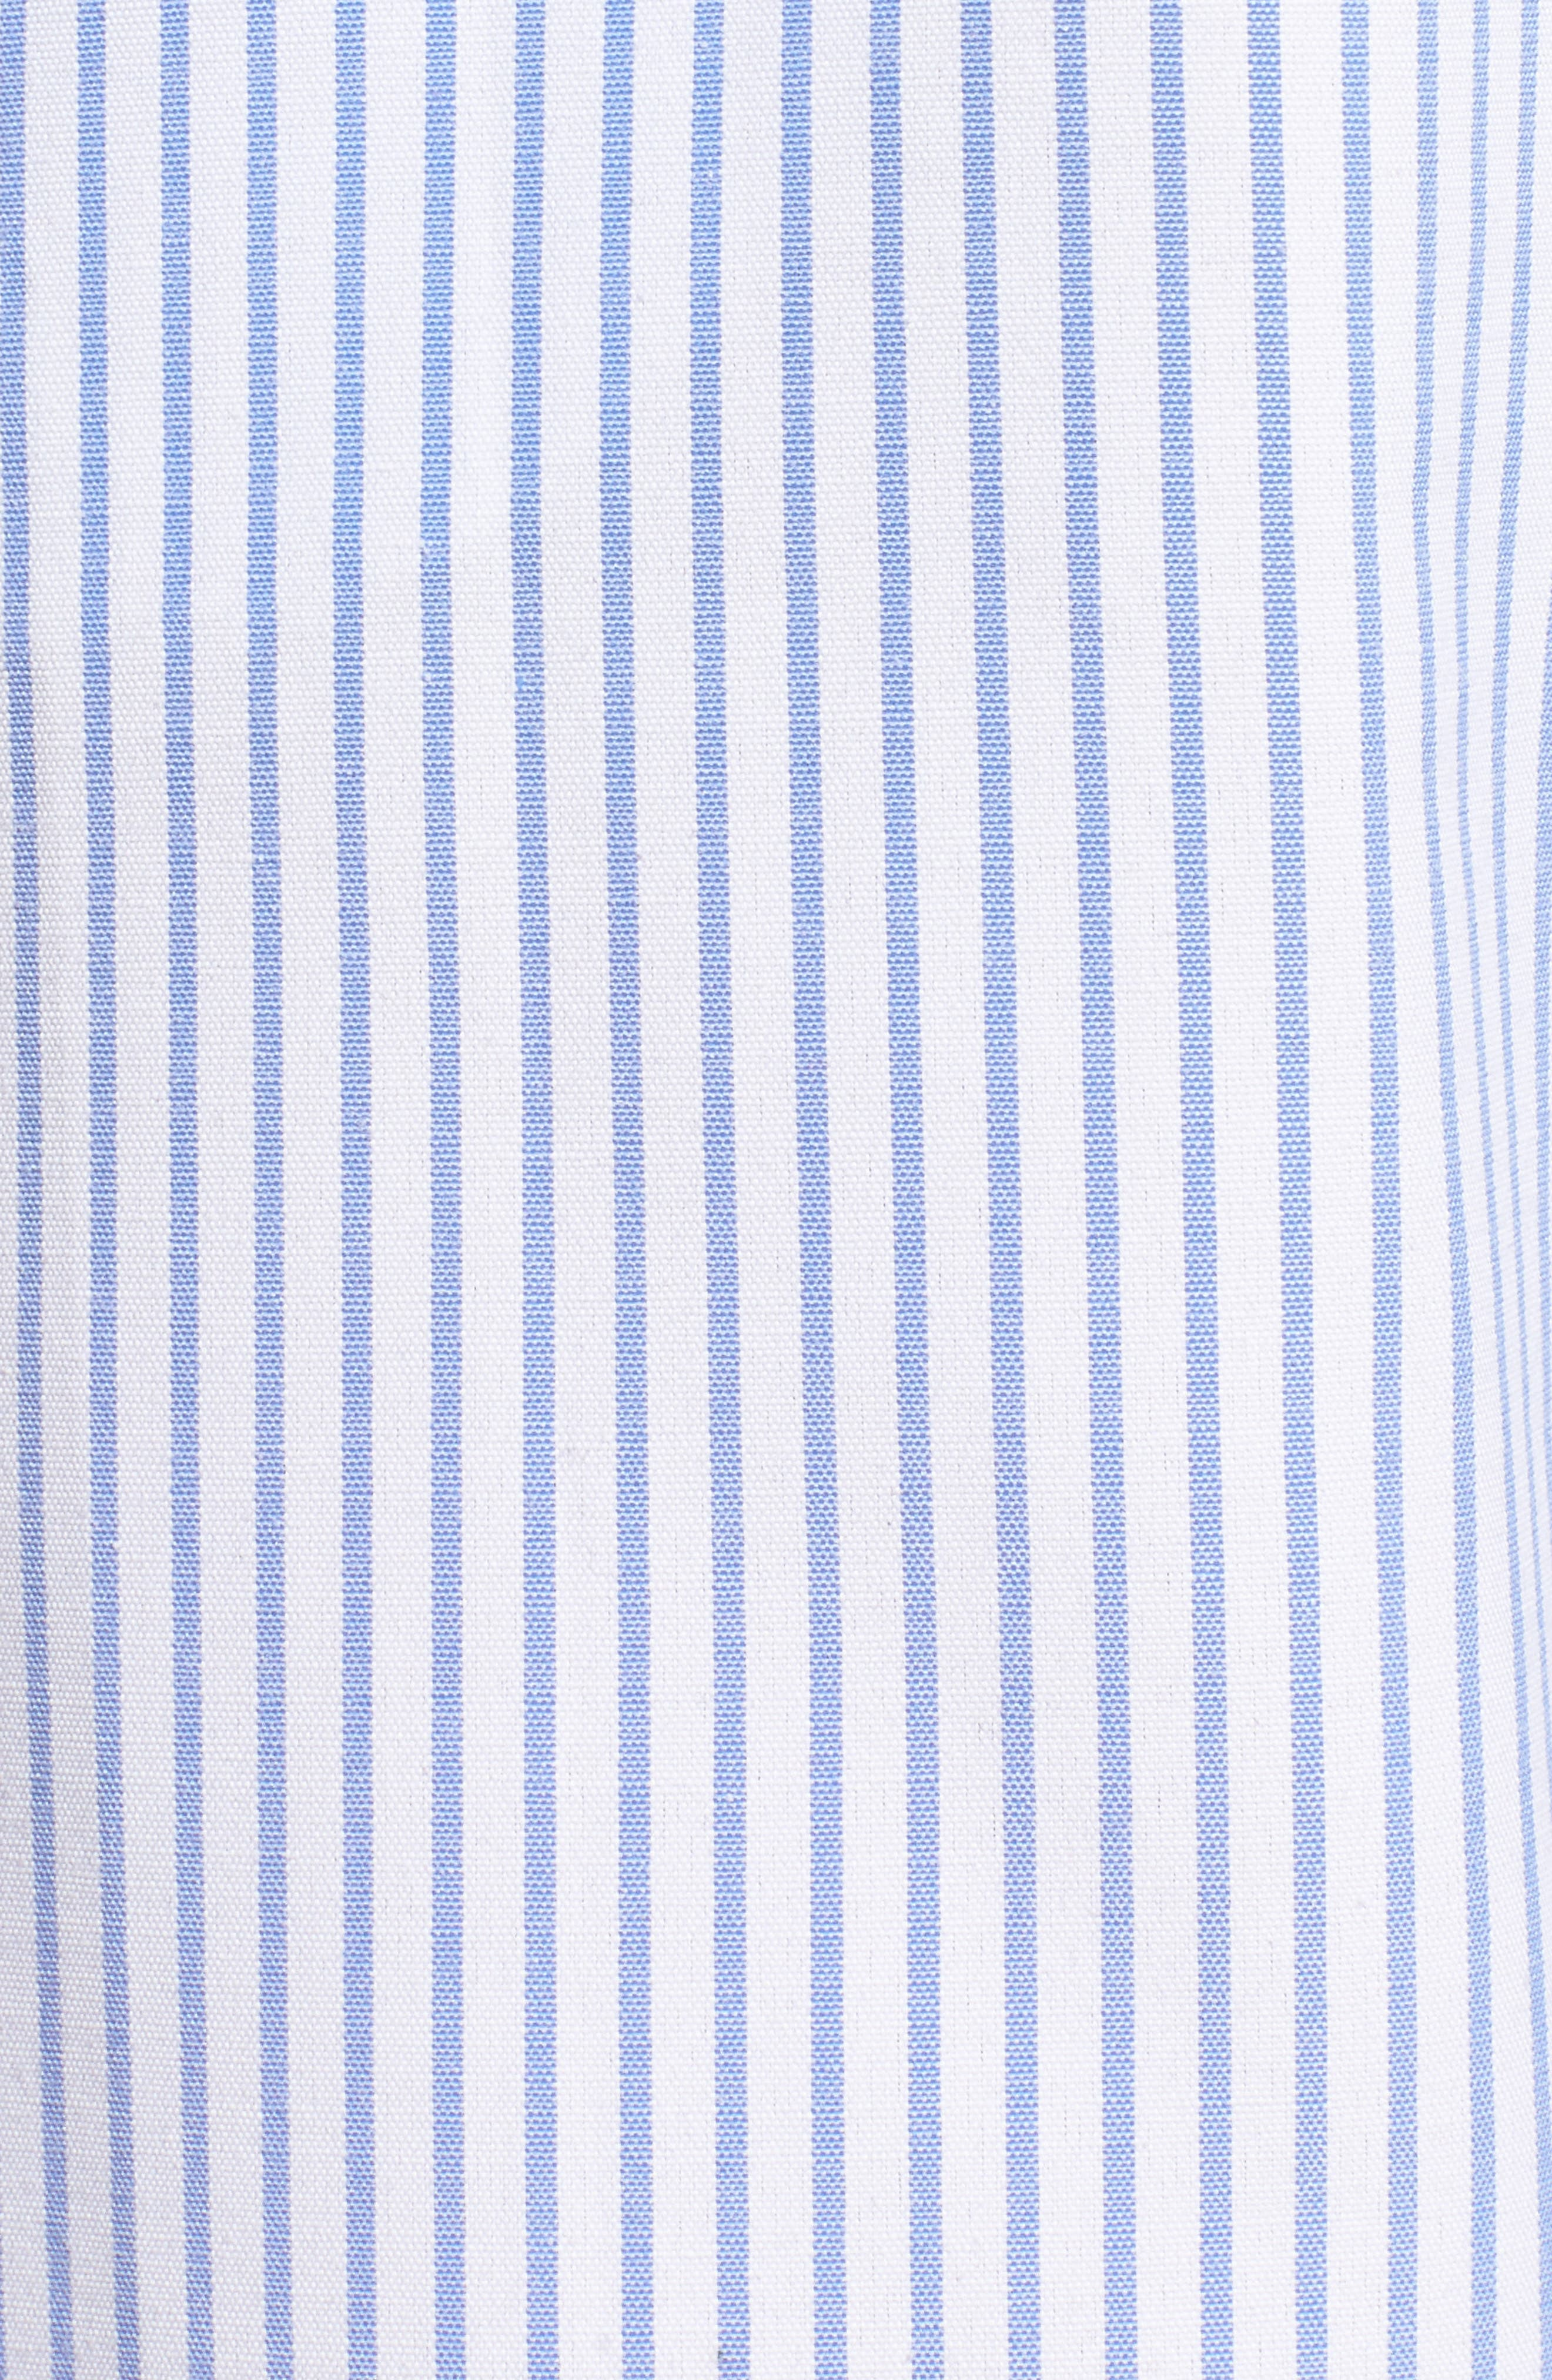 Off the Shoulder Jumpsuit,                             Alternate thumbnail 6, color,                             Denim Stripe